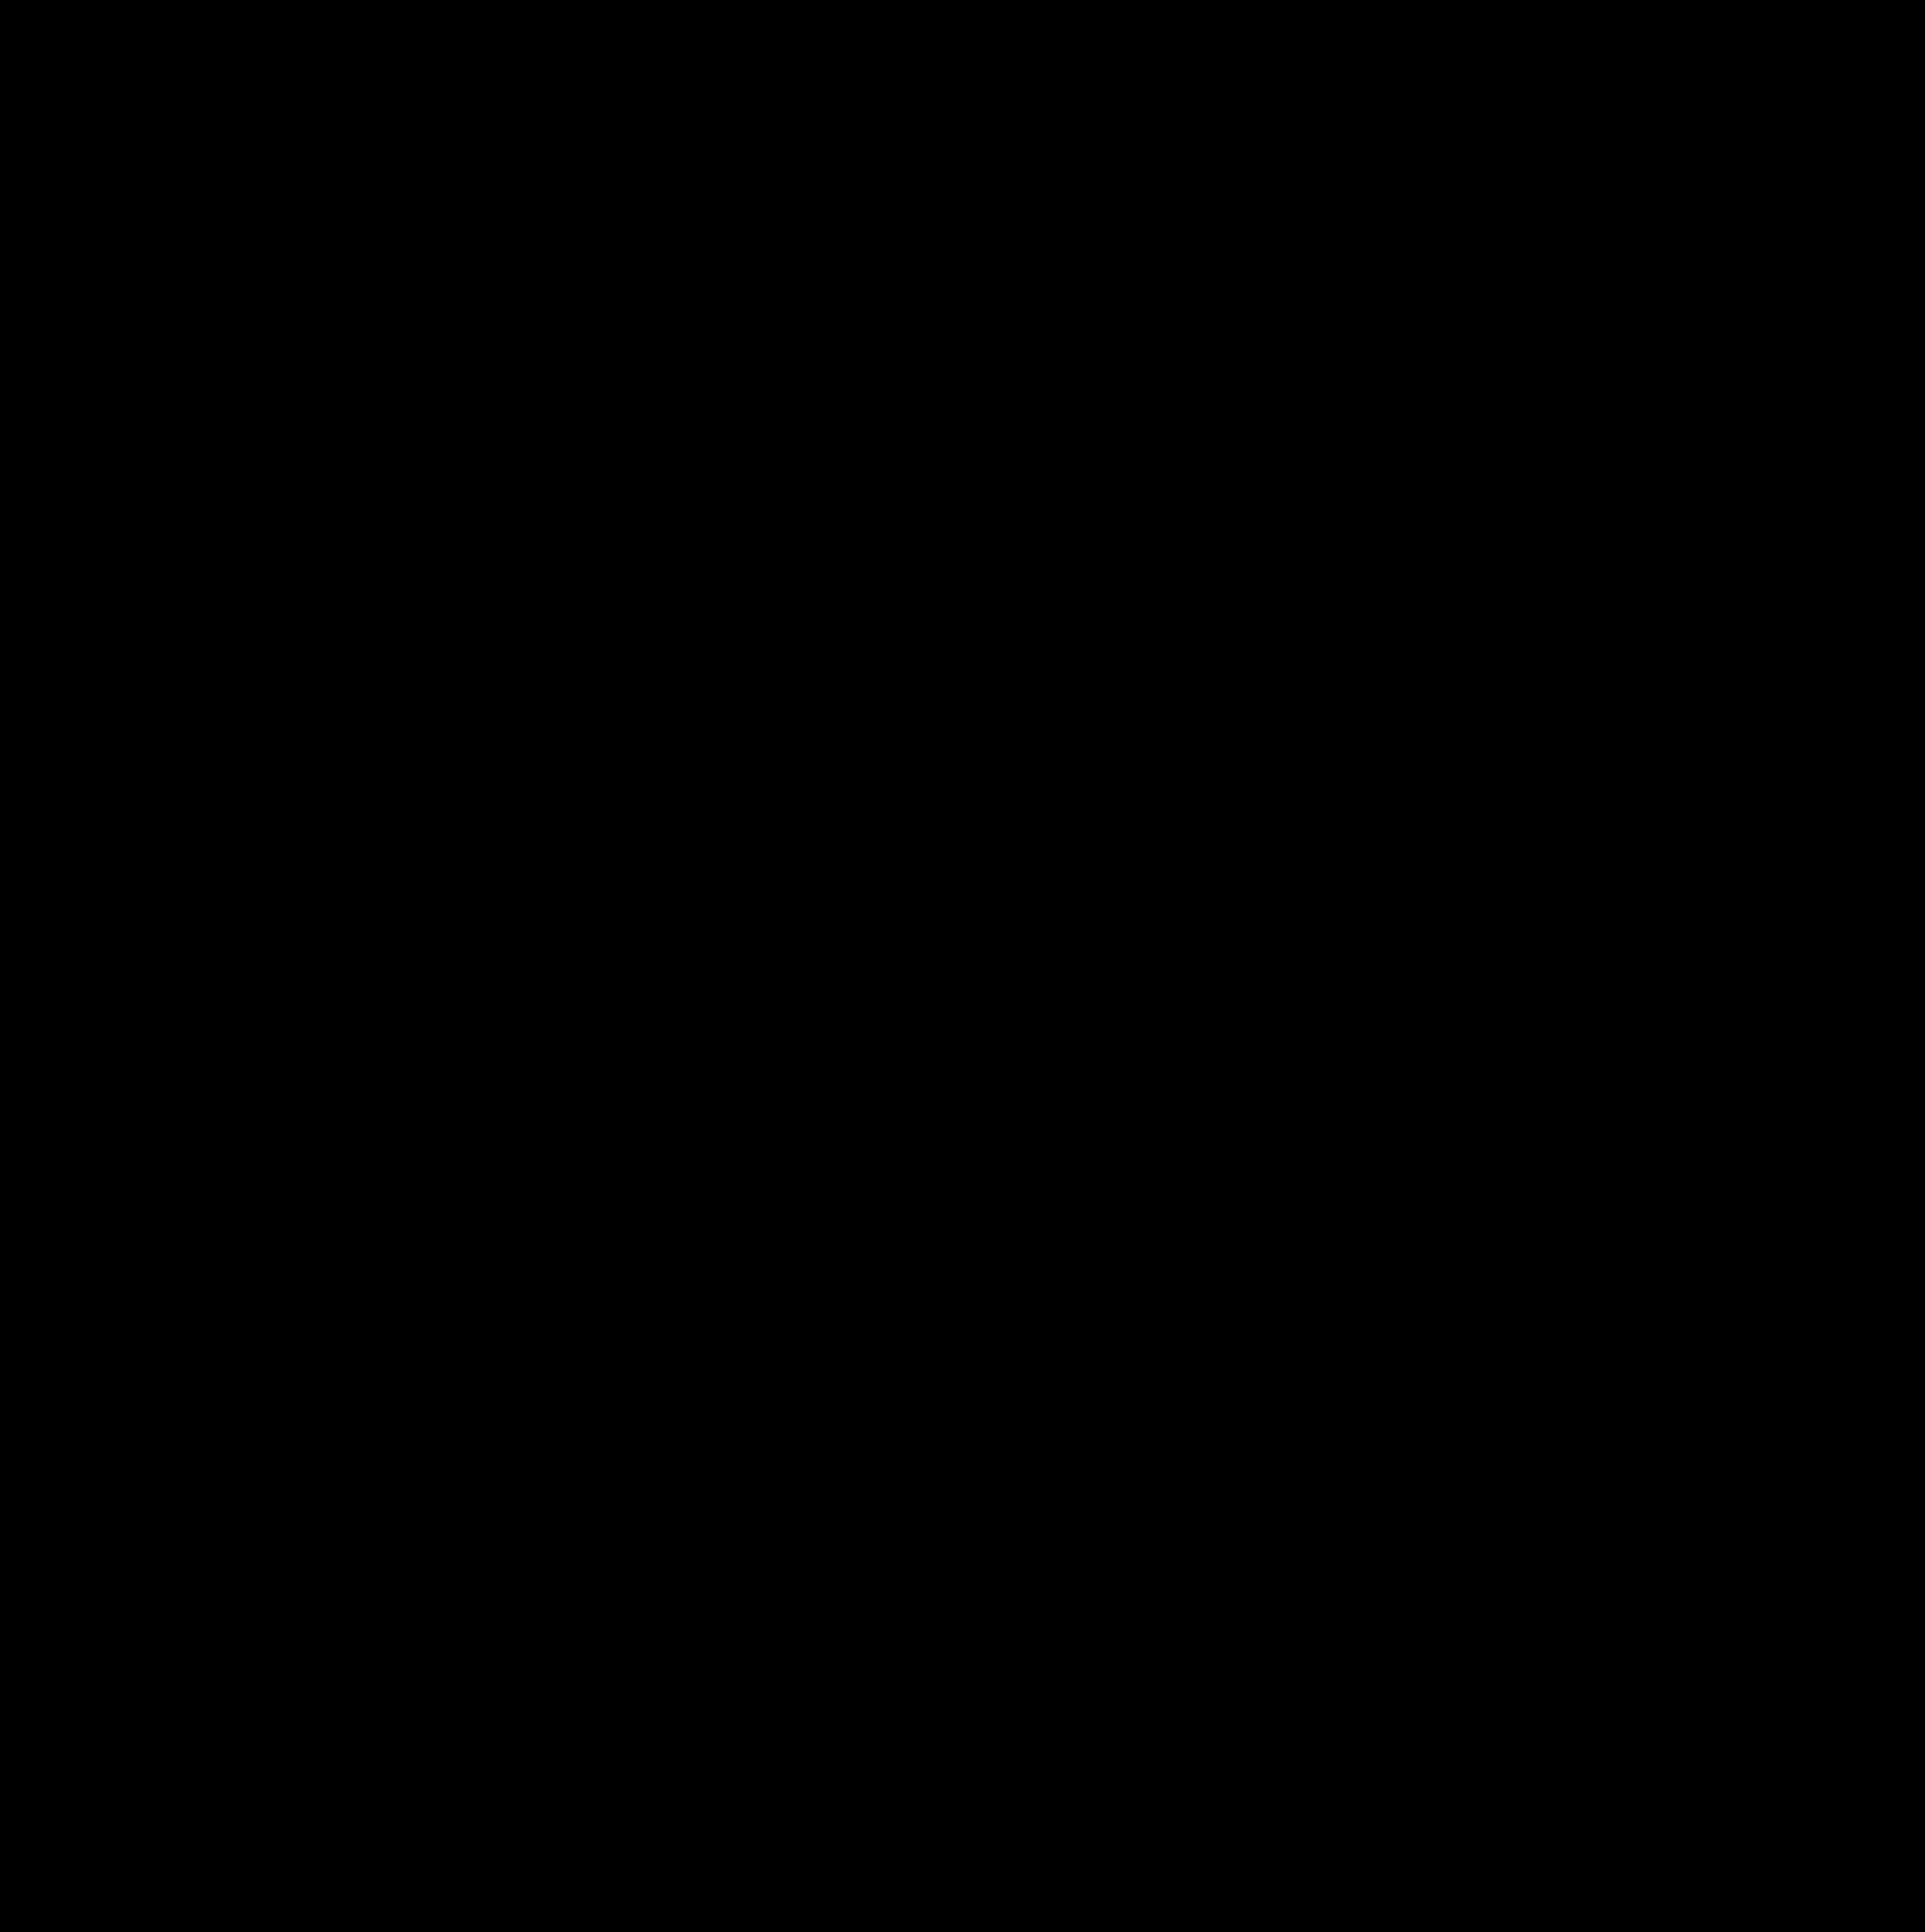 y si-logo-black.png